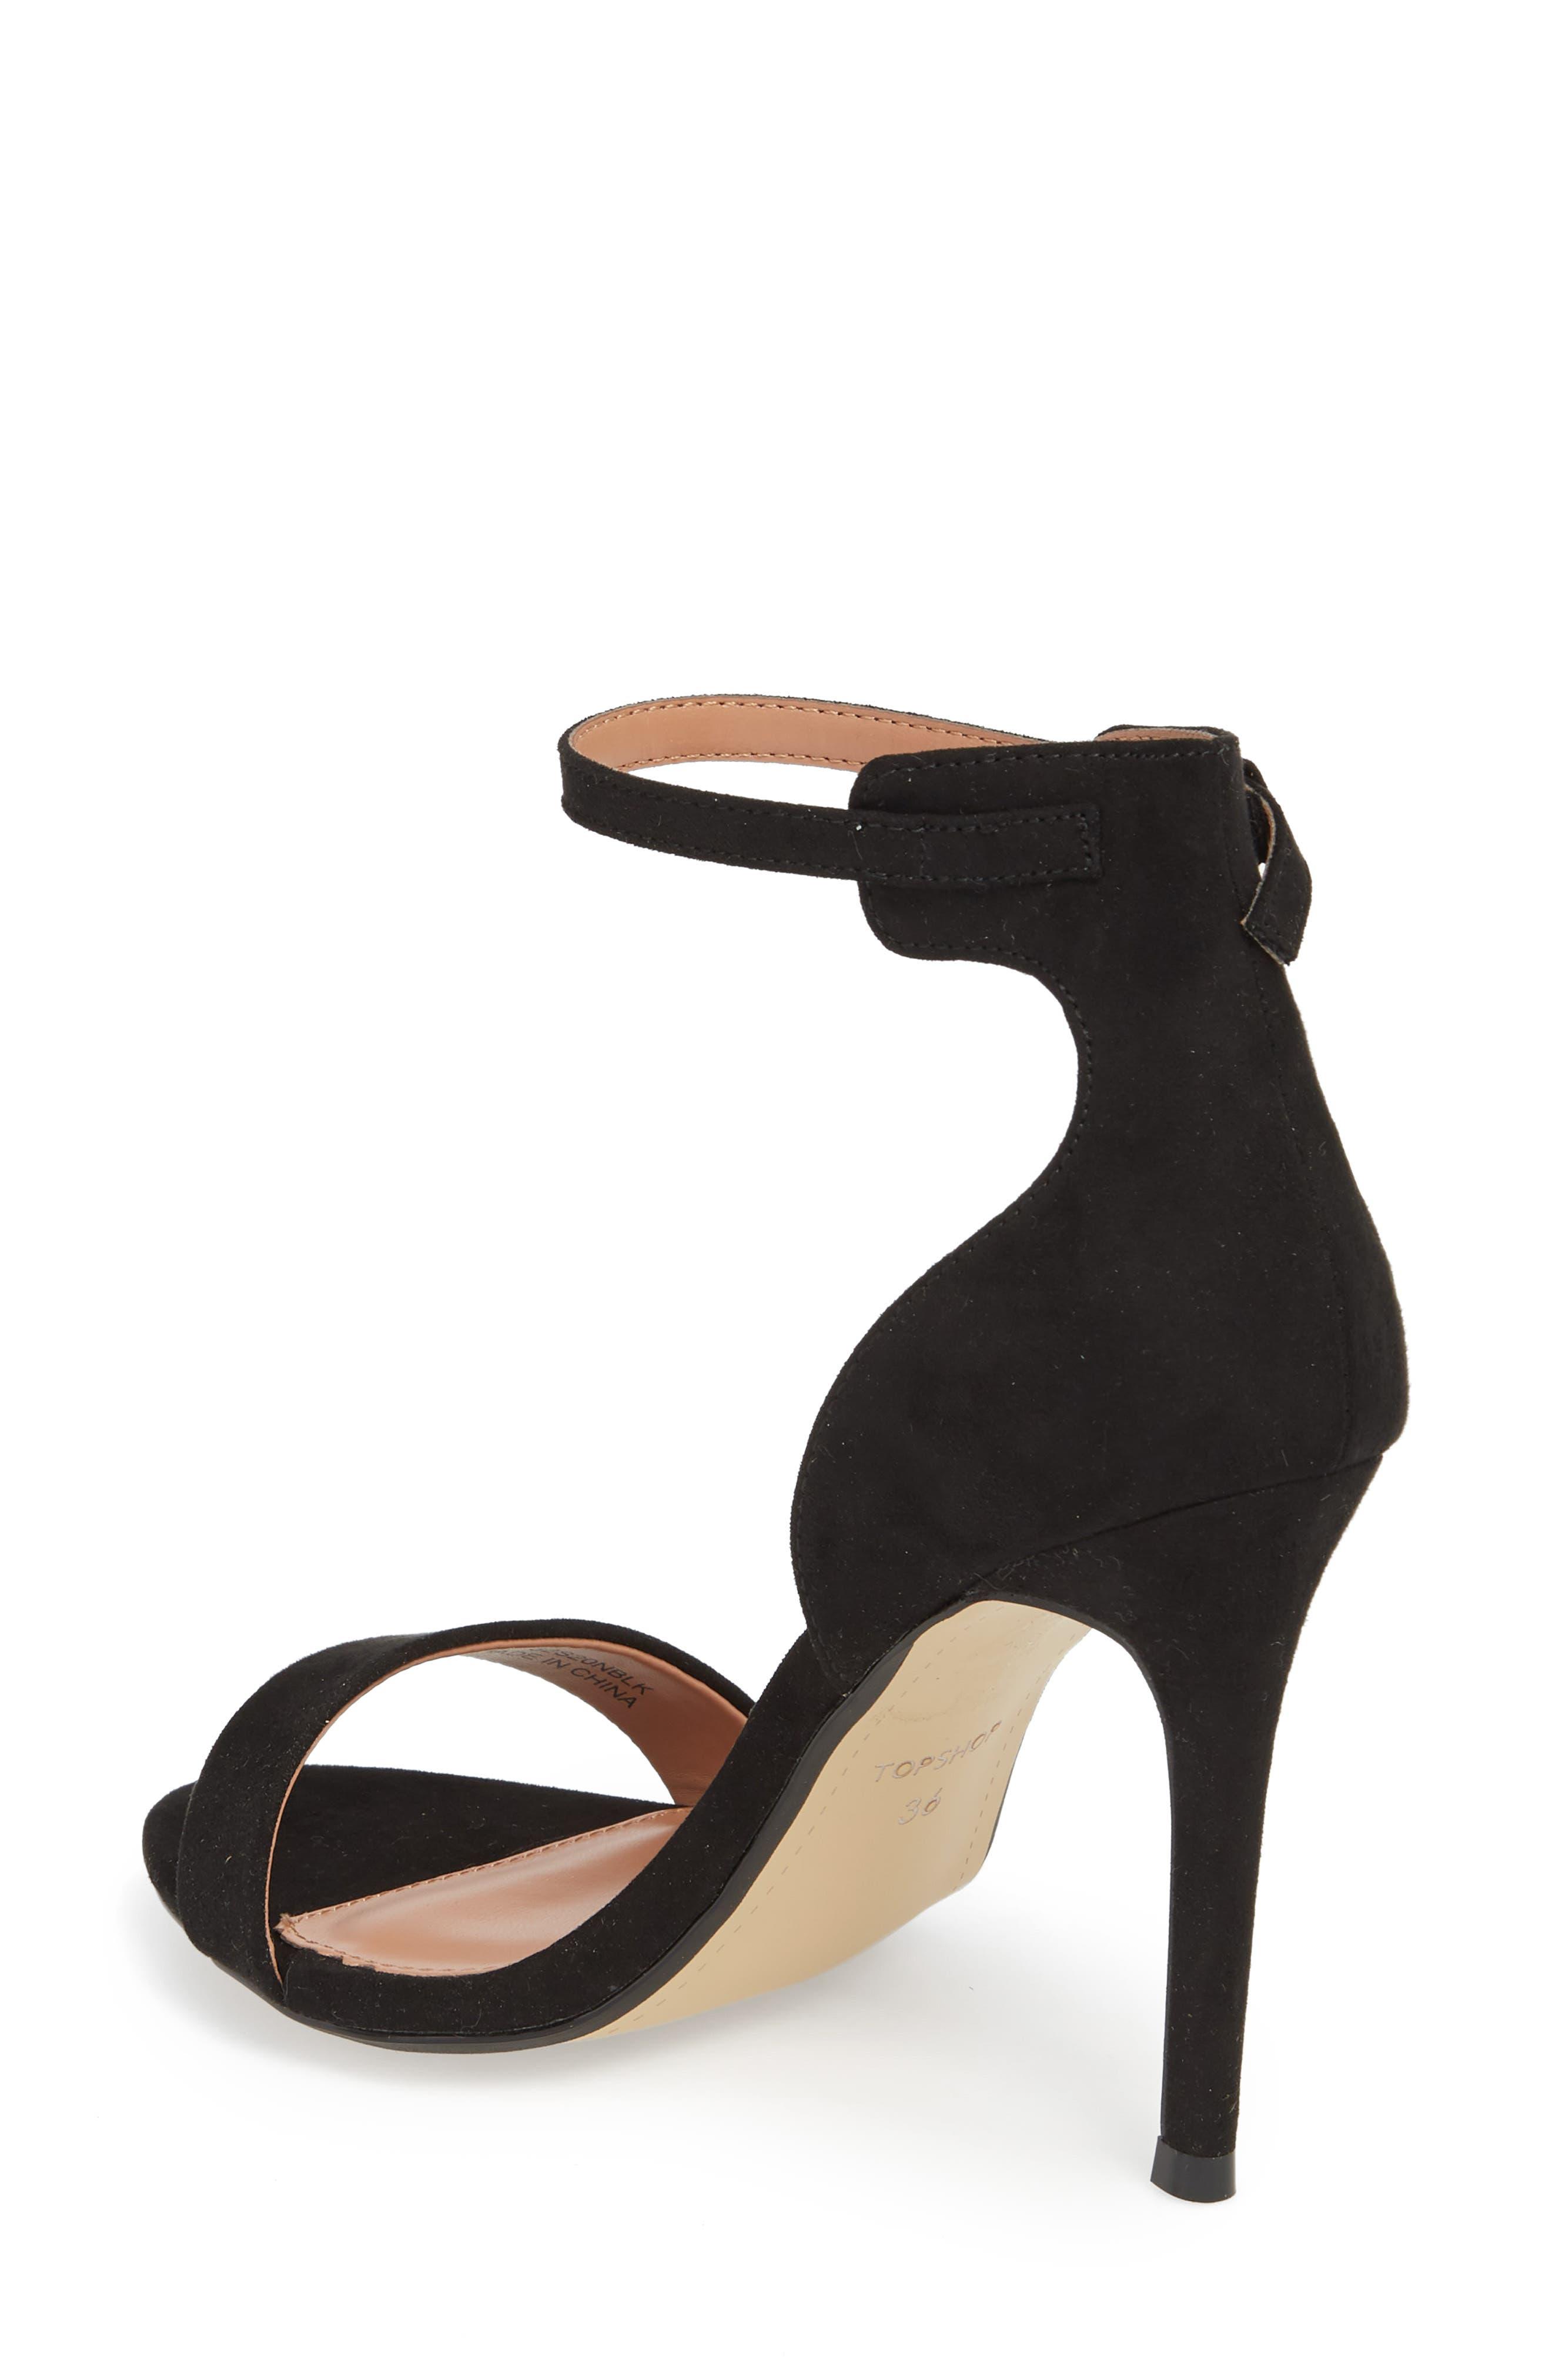 Marcelle Ankle Strap Sandal,                             Alternate thumbnail 2, color,                             BLACK